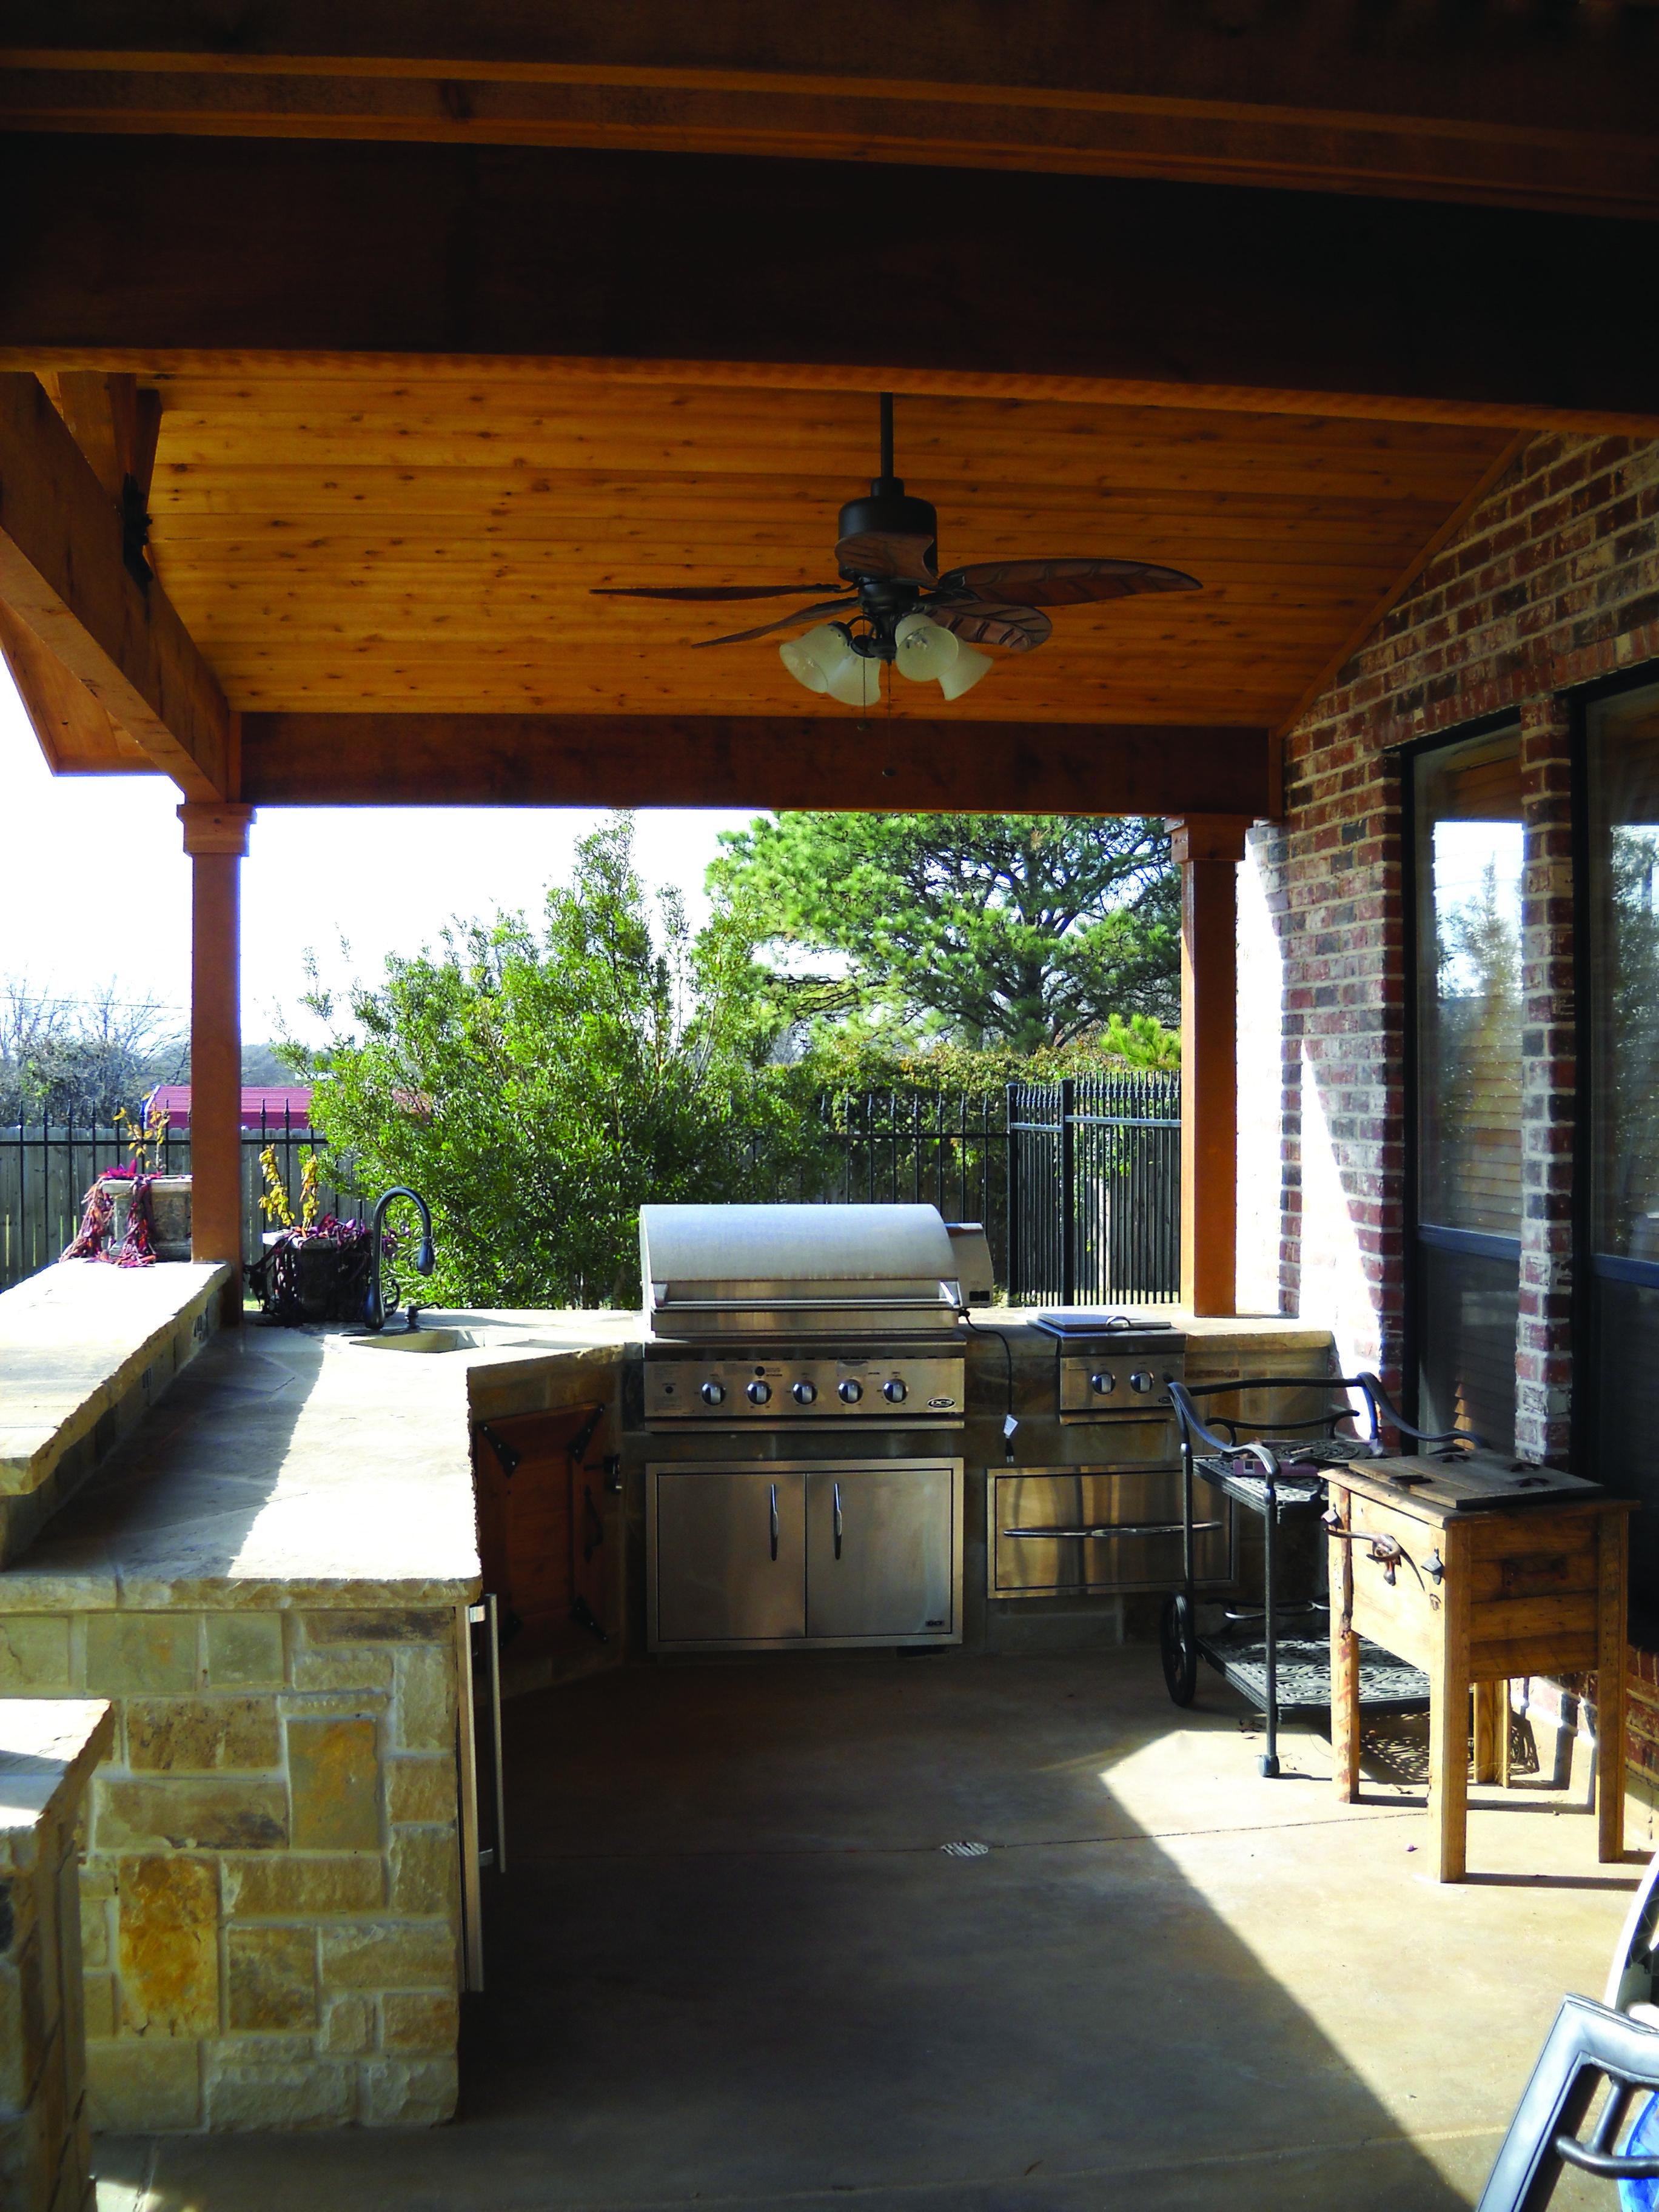 Rustic Outdoor Kitchen Design Outdoor Kitchen Countertops Outdoor Kitchen Design Outdoor Kitchen